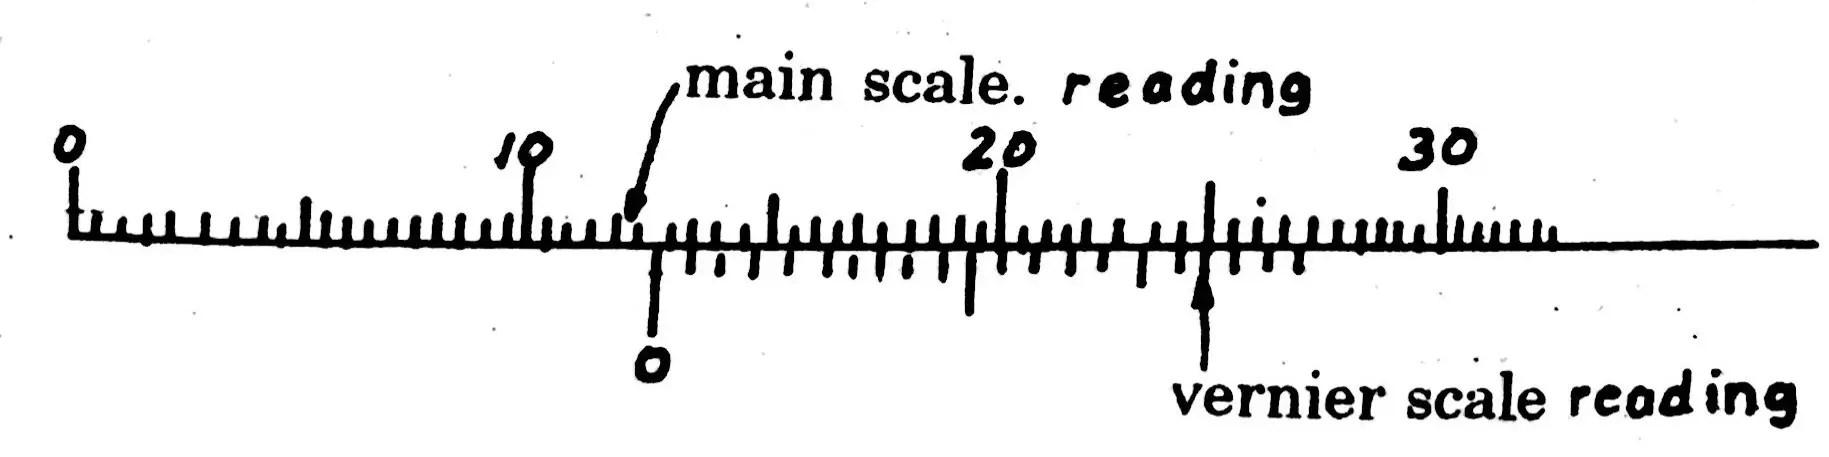 hight resolution of vernier calliper diagram